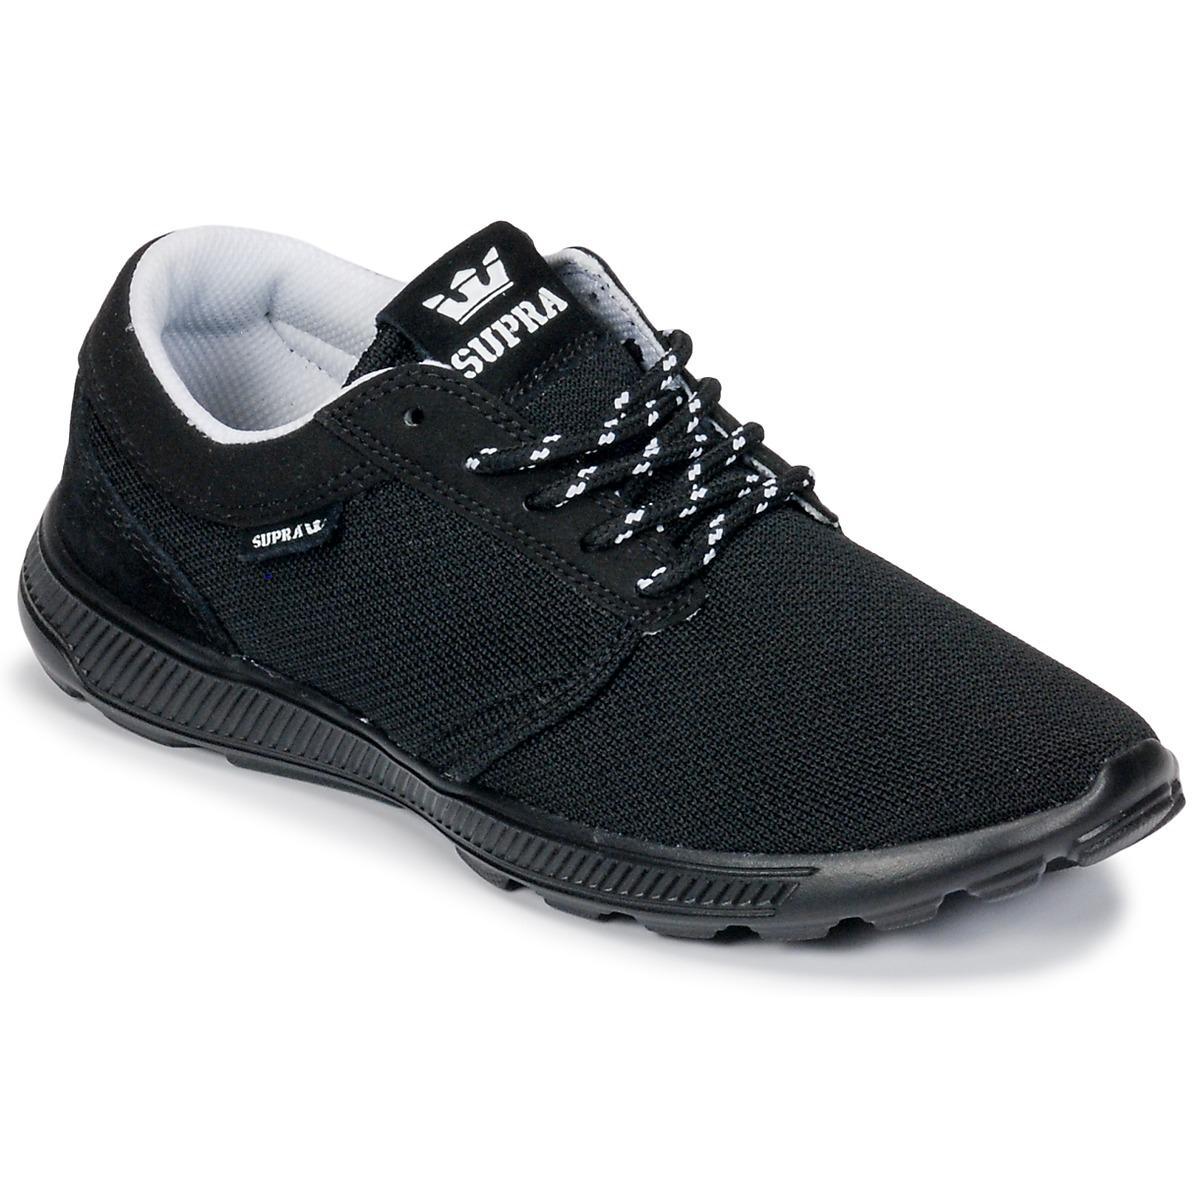 65d099fa708d Supra - Hammer Run Men s Shoes (trainers) In Black for Men - Lyst. View  fullscreen